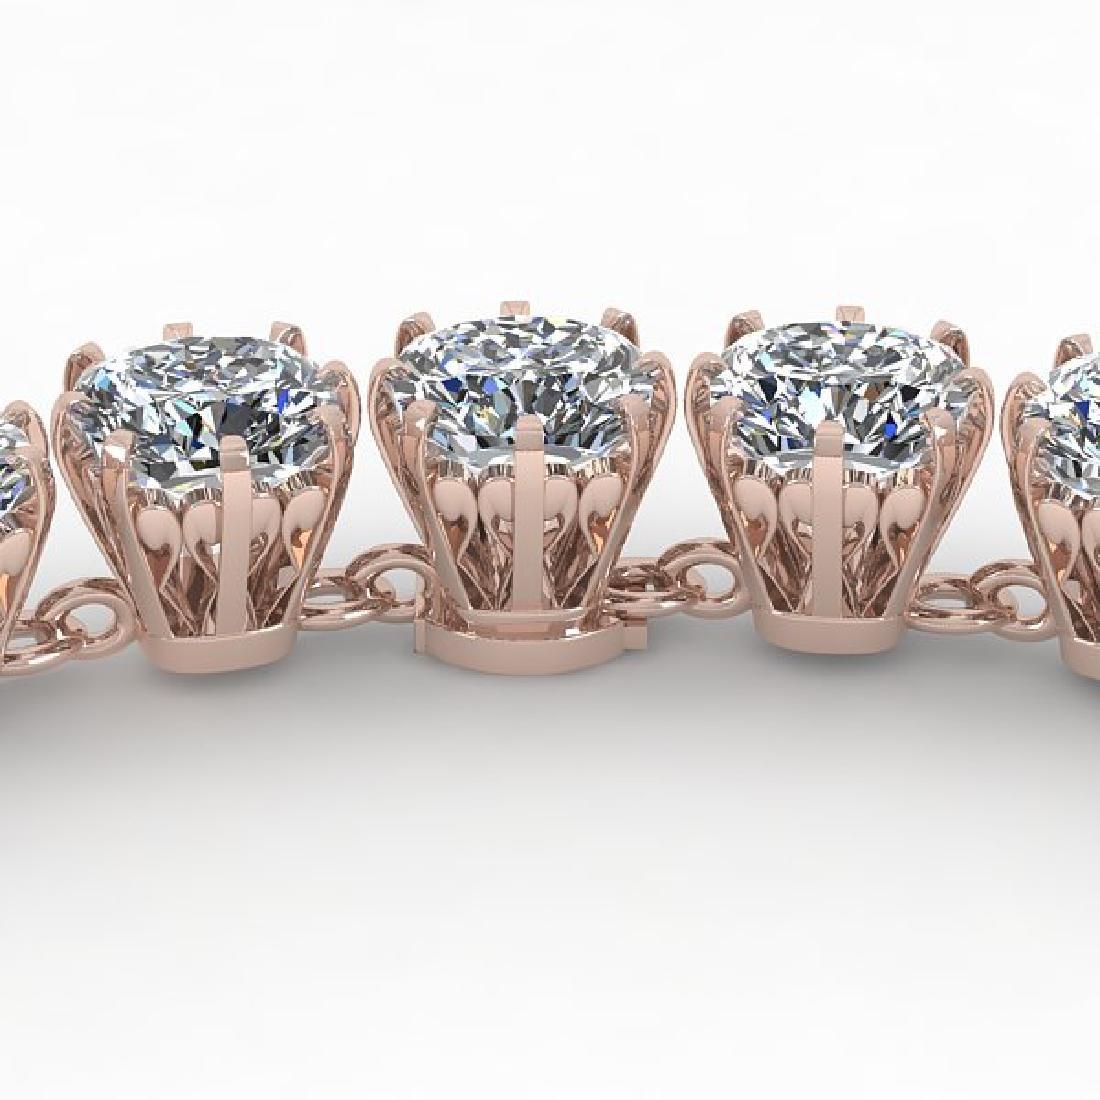 28 CTW Oval Cut SI Certified Diamond Necklace 18K Rose